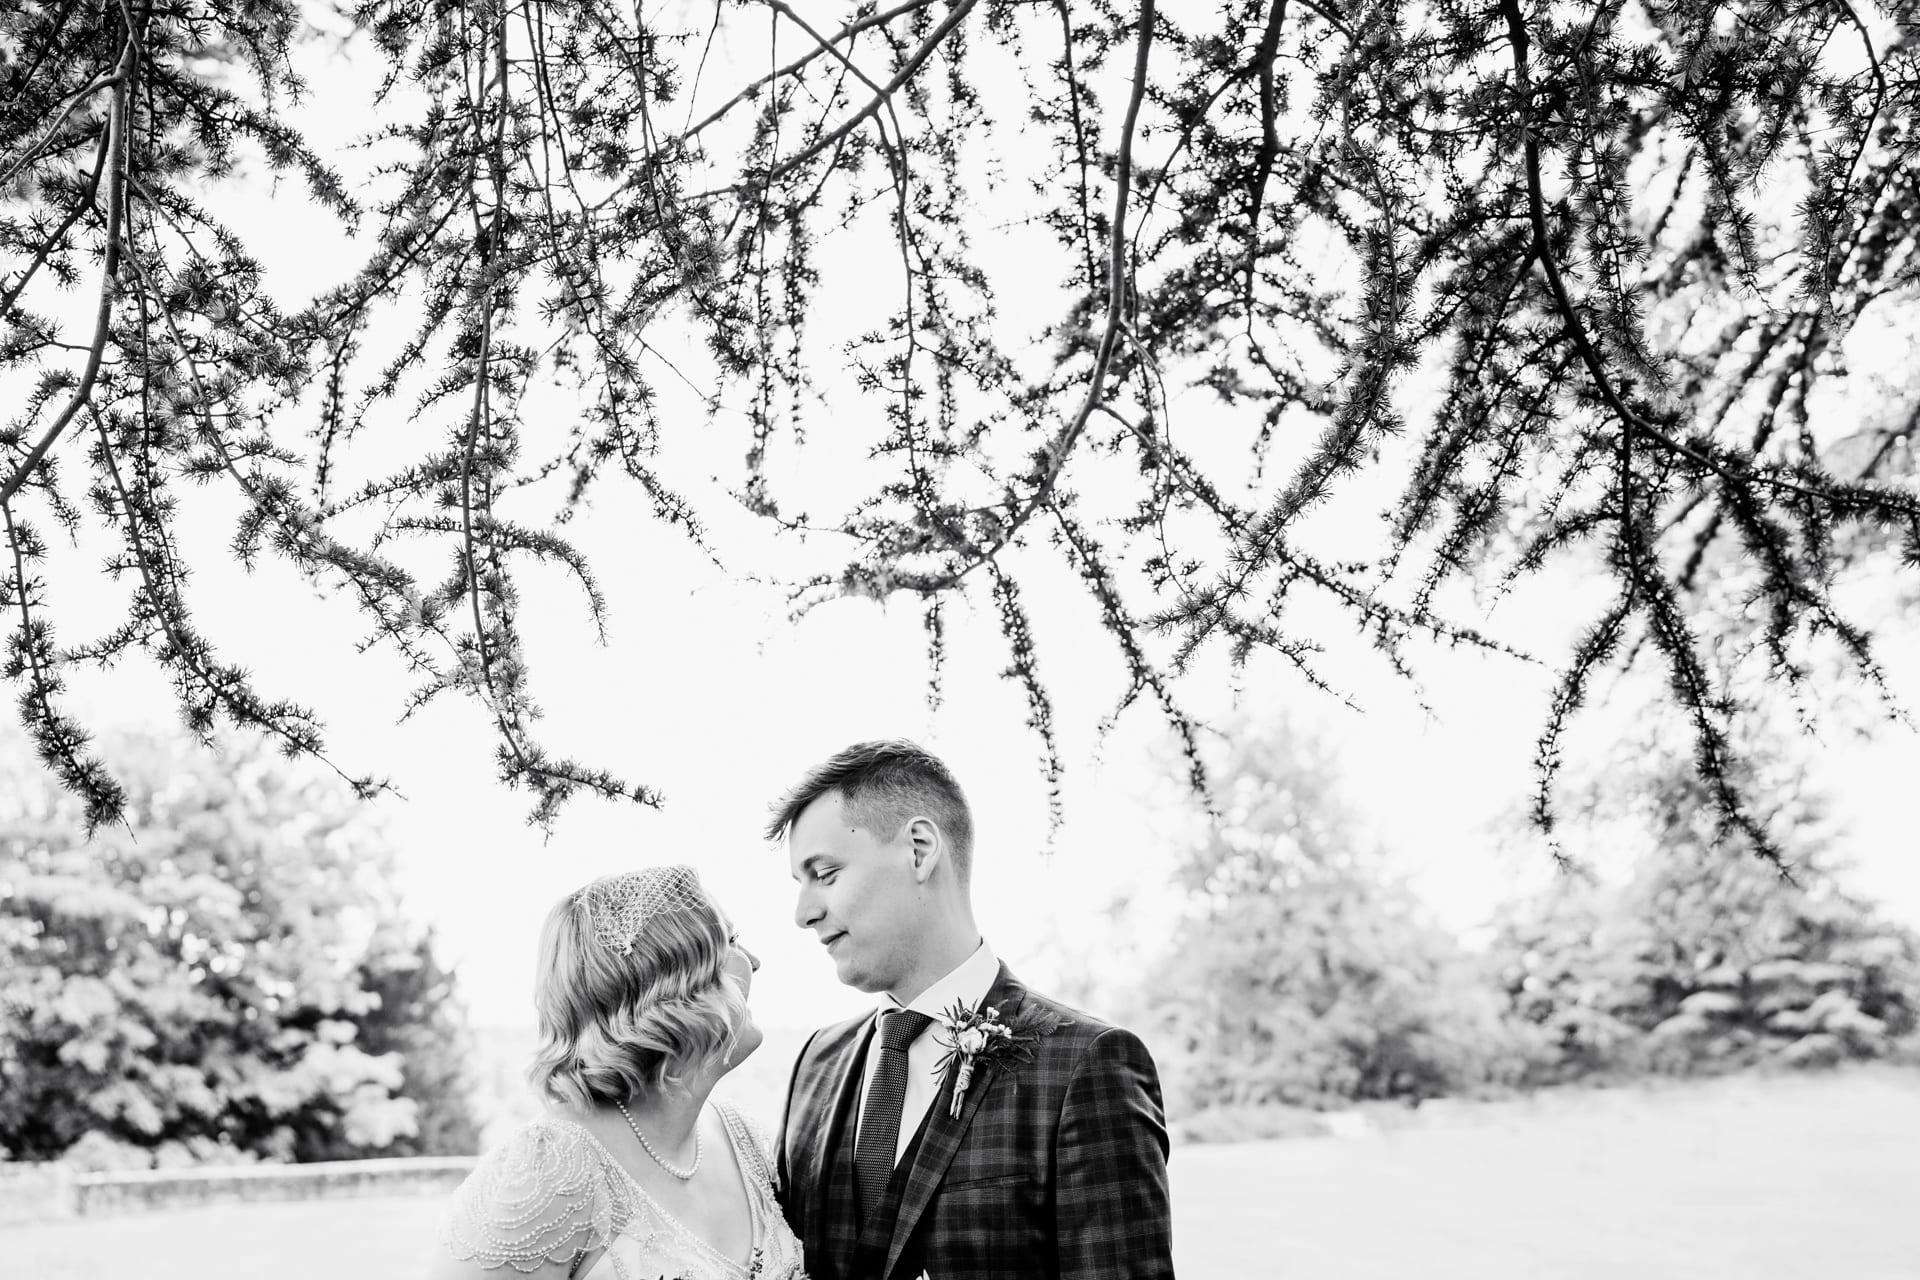 Wedding photography at Farrnham Castle in Surrey